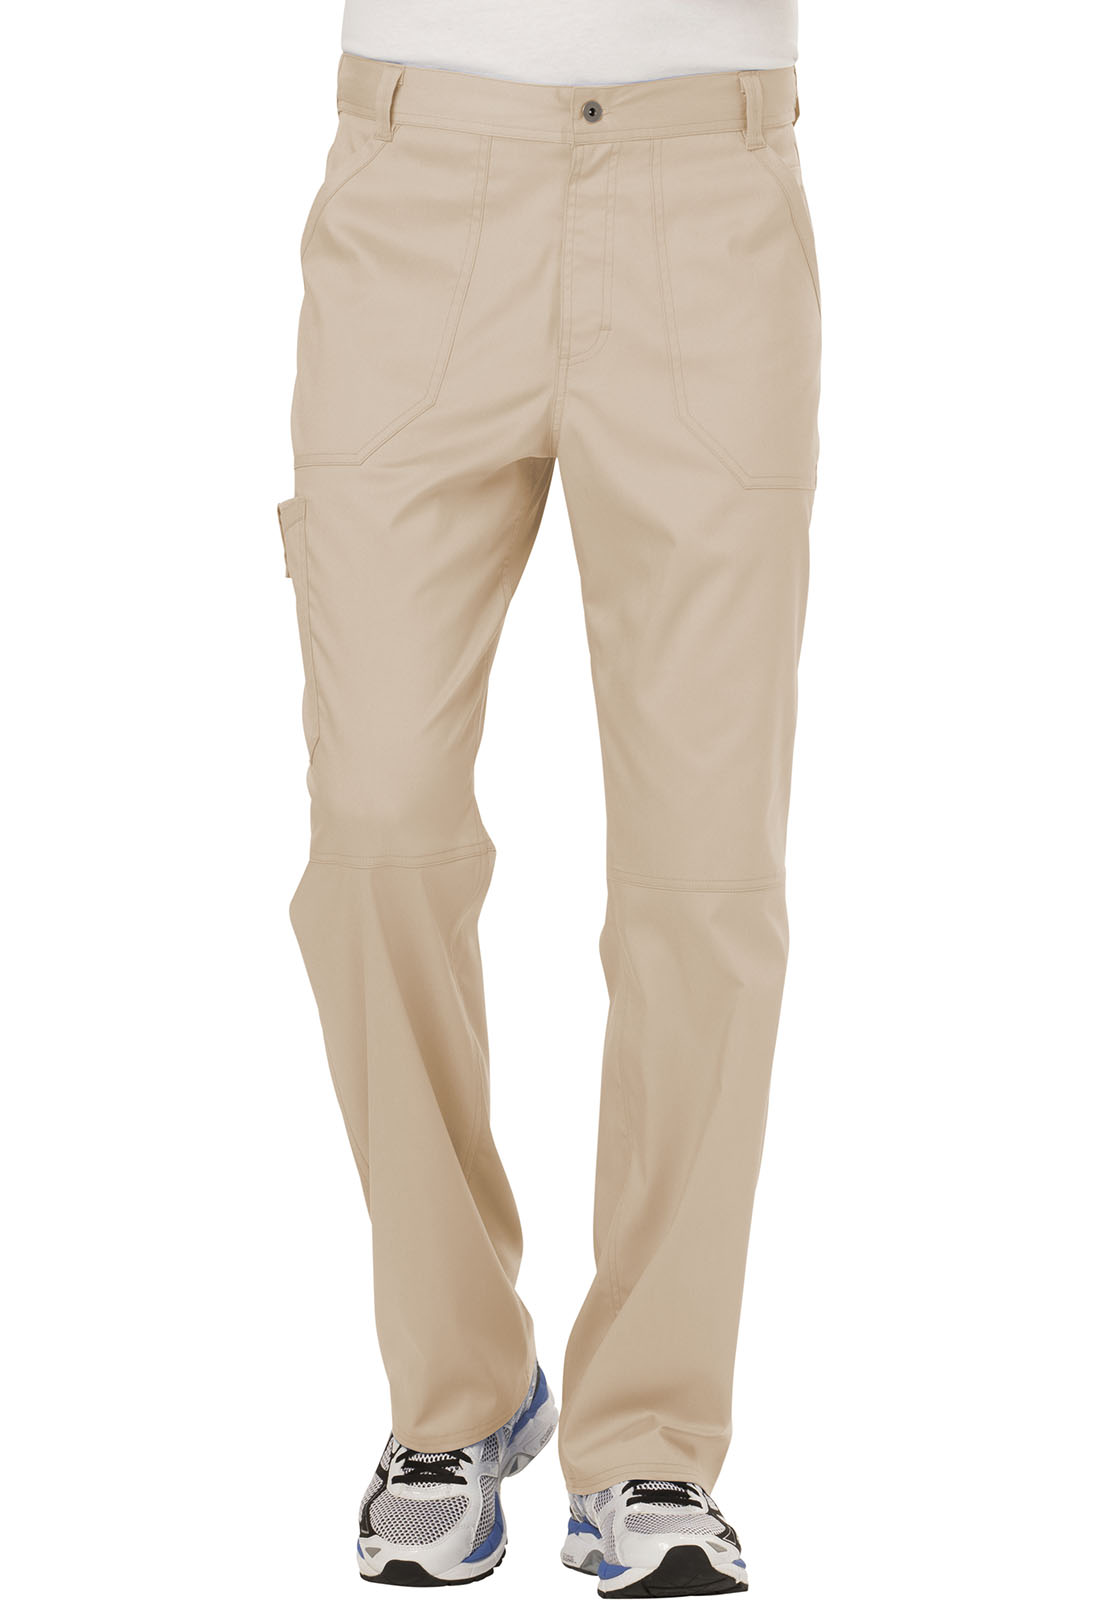 f01107f174f WW Revolution Men's Fly Front Pant in Khaki WW140-KAK from Cherokee ...